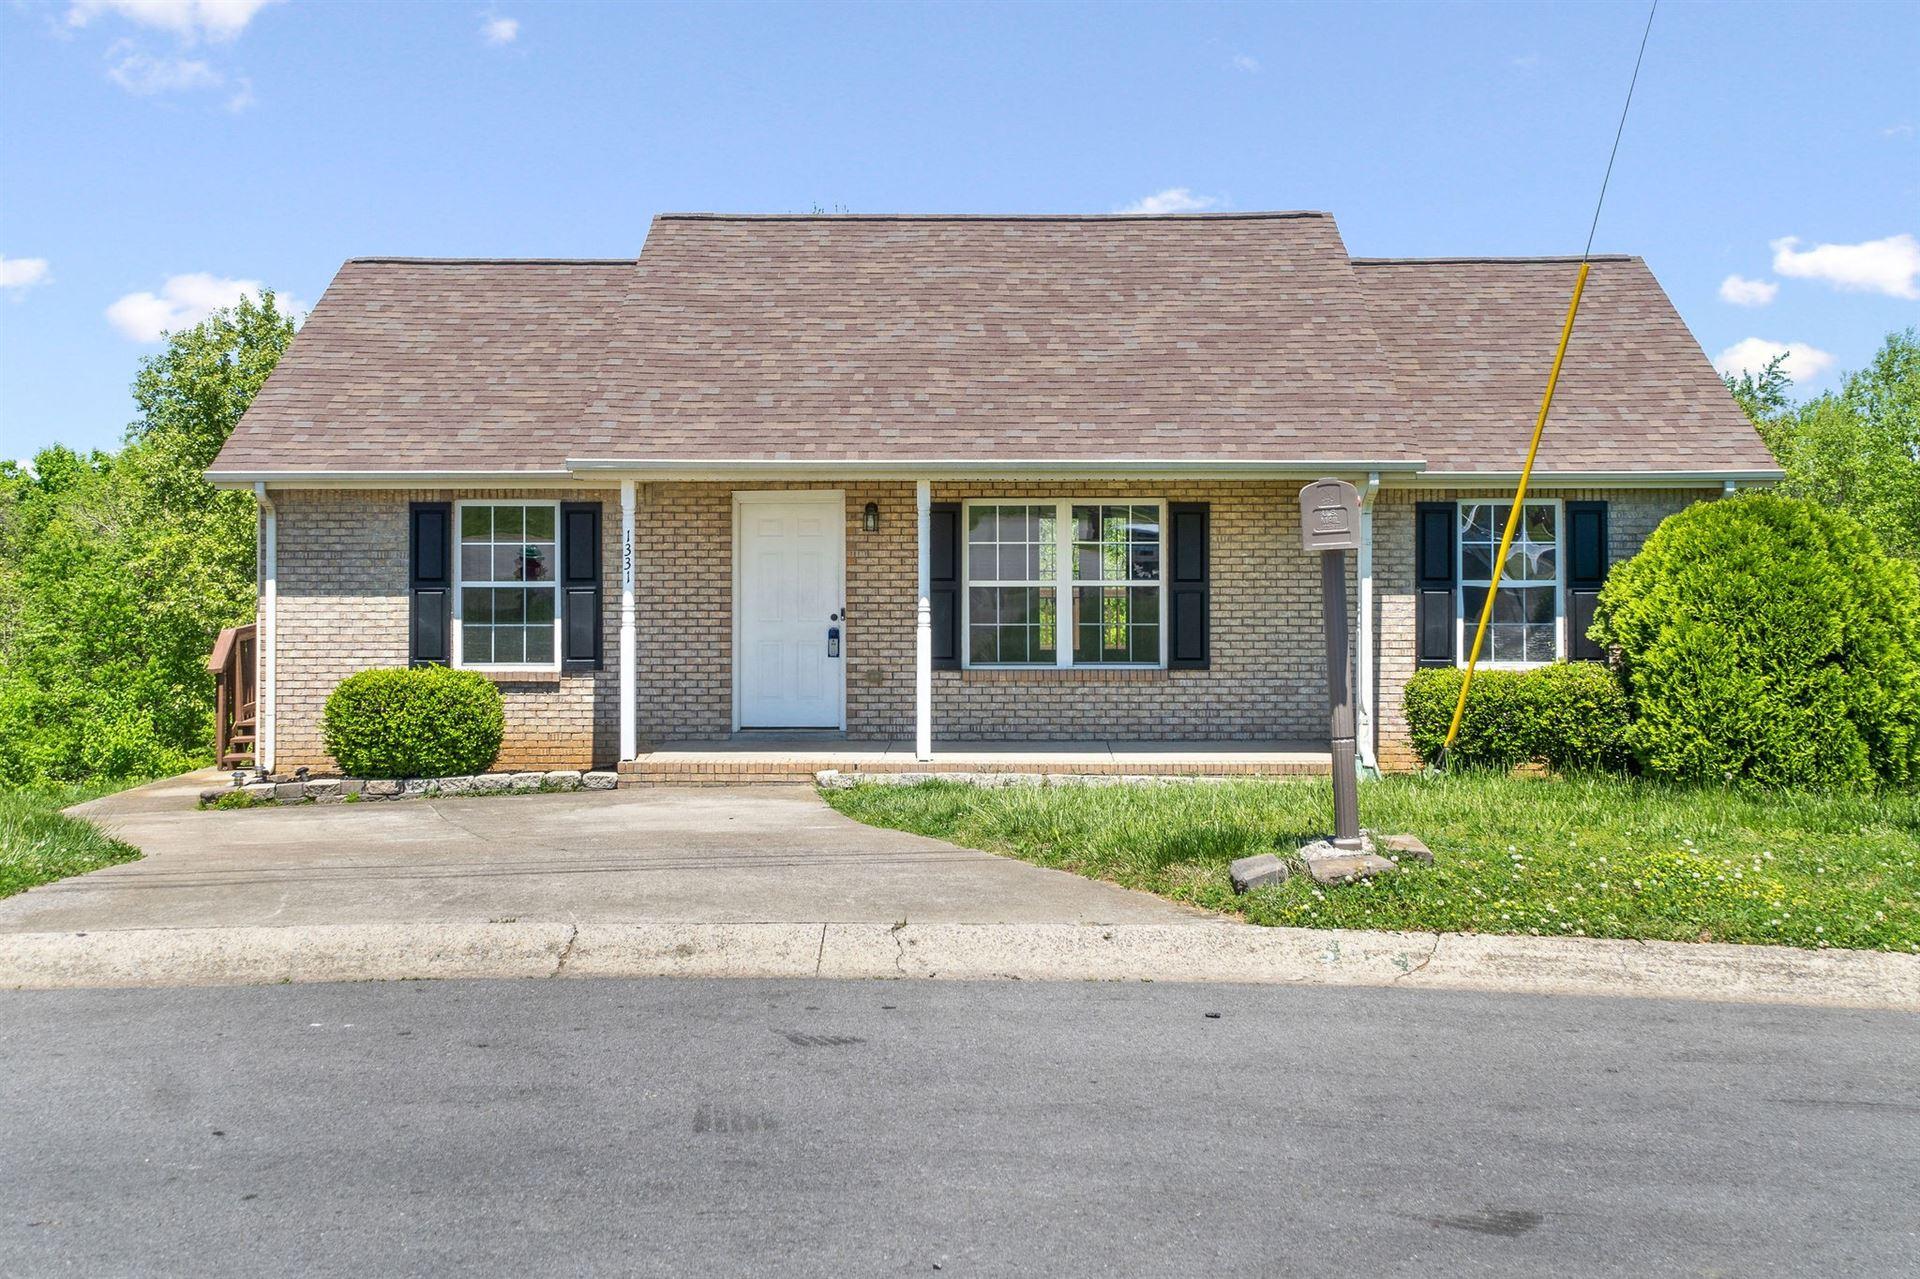 1331 Burchett Dr, Clarksville, TN 37042 - MLS#: 2249891